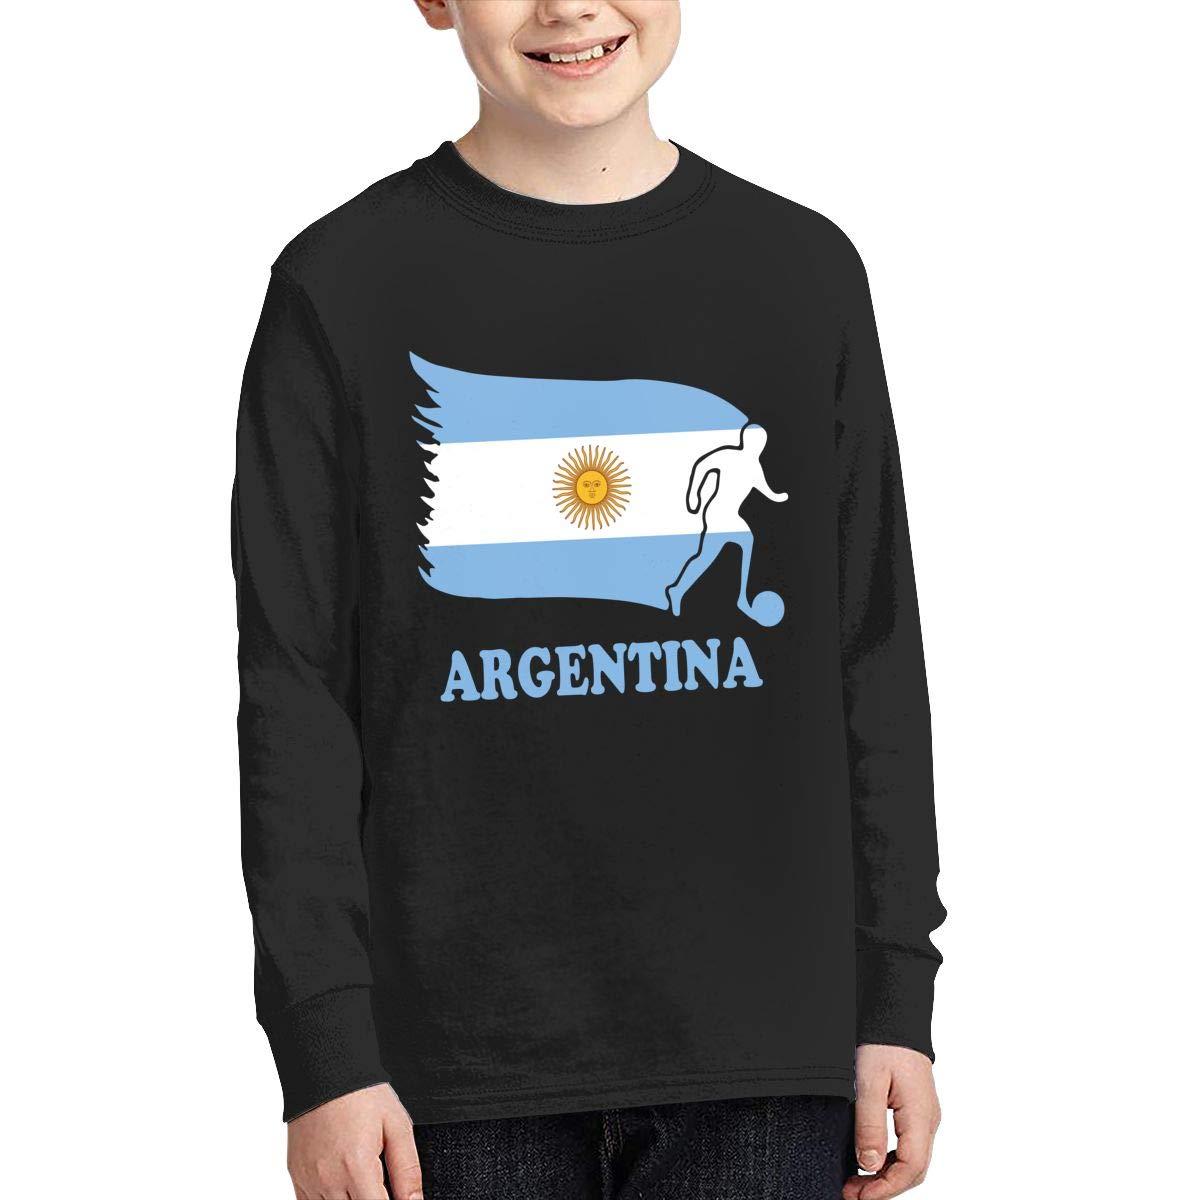 Teenagers Teen Girls Argentina Football Soccer Flag Printed Long Sleeve 100/% Cotton Tops